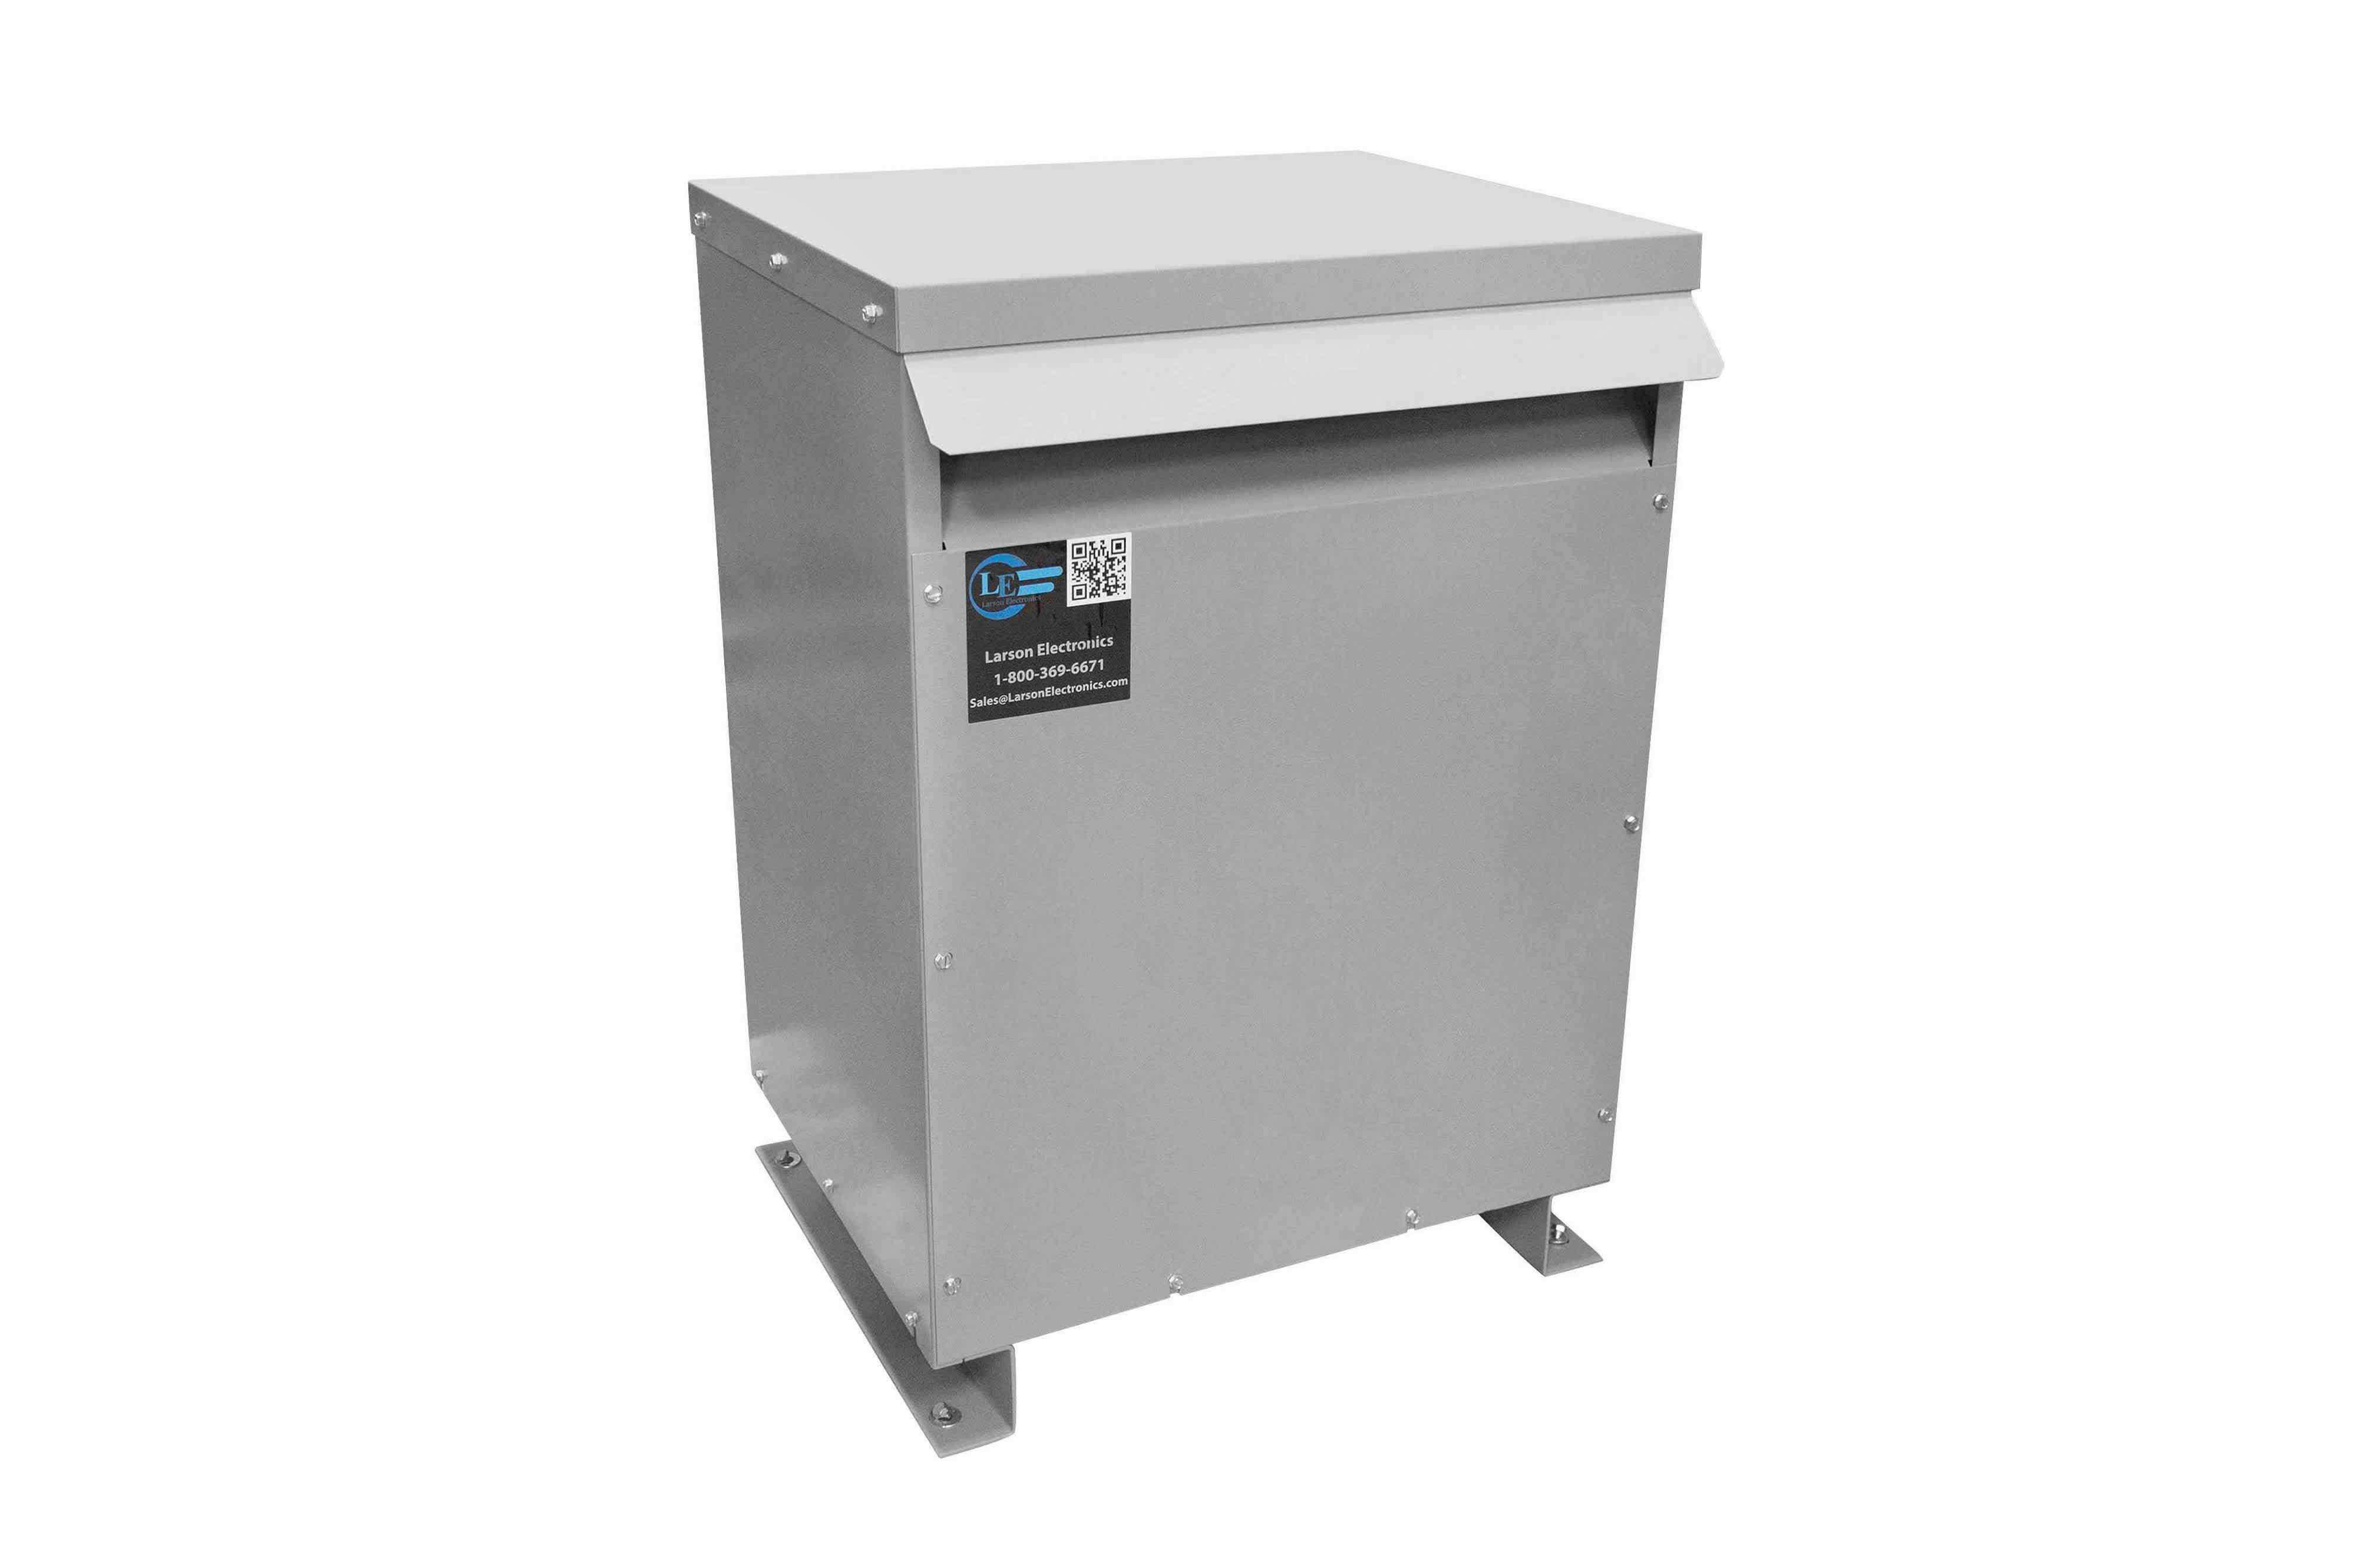 12 kVA 3PH Isolation Transformer, 380V Wye Primary, 208V Delta Secondary, N3R, Ventilated, 60 Hz